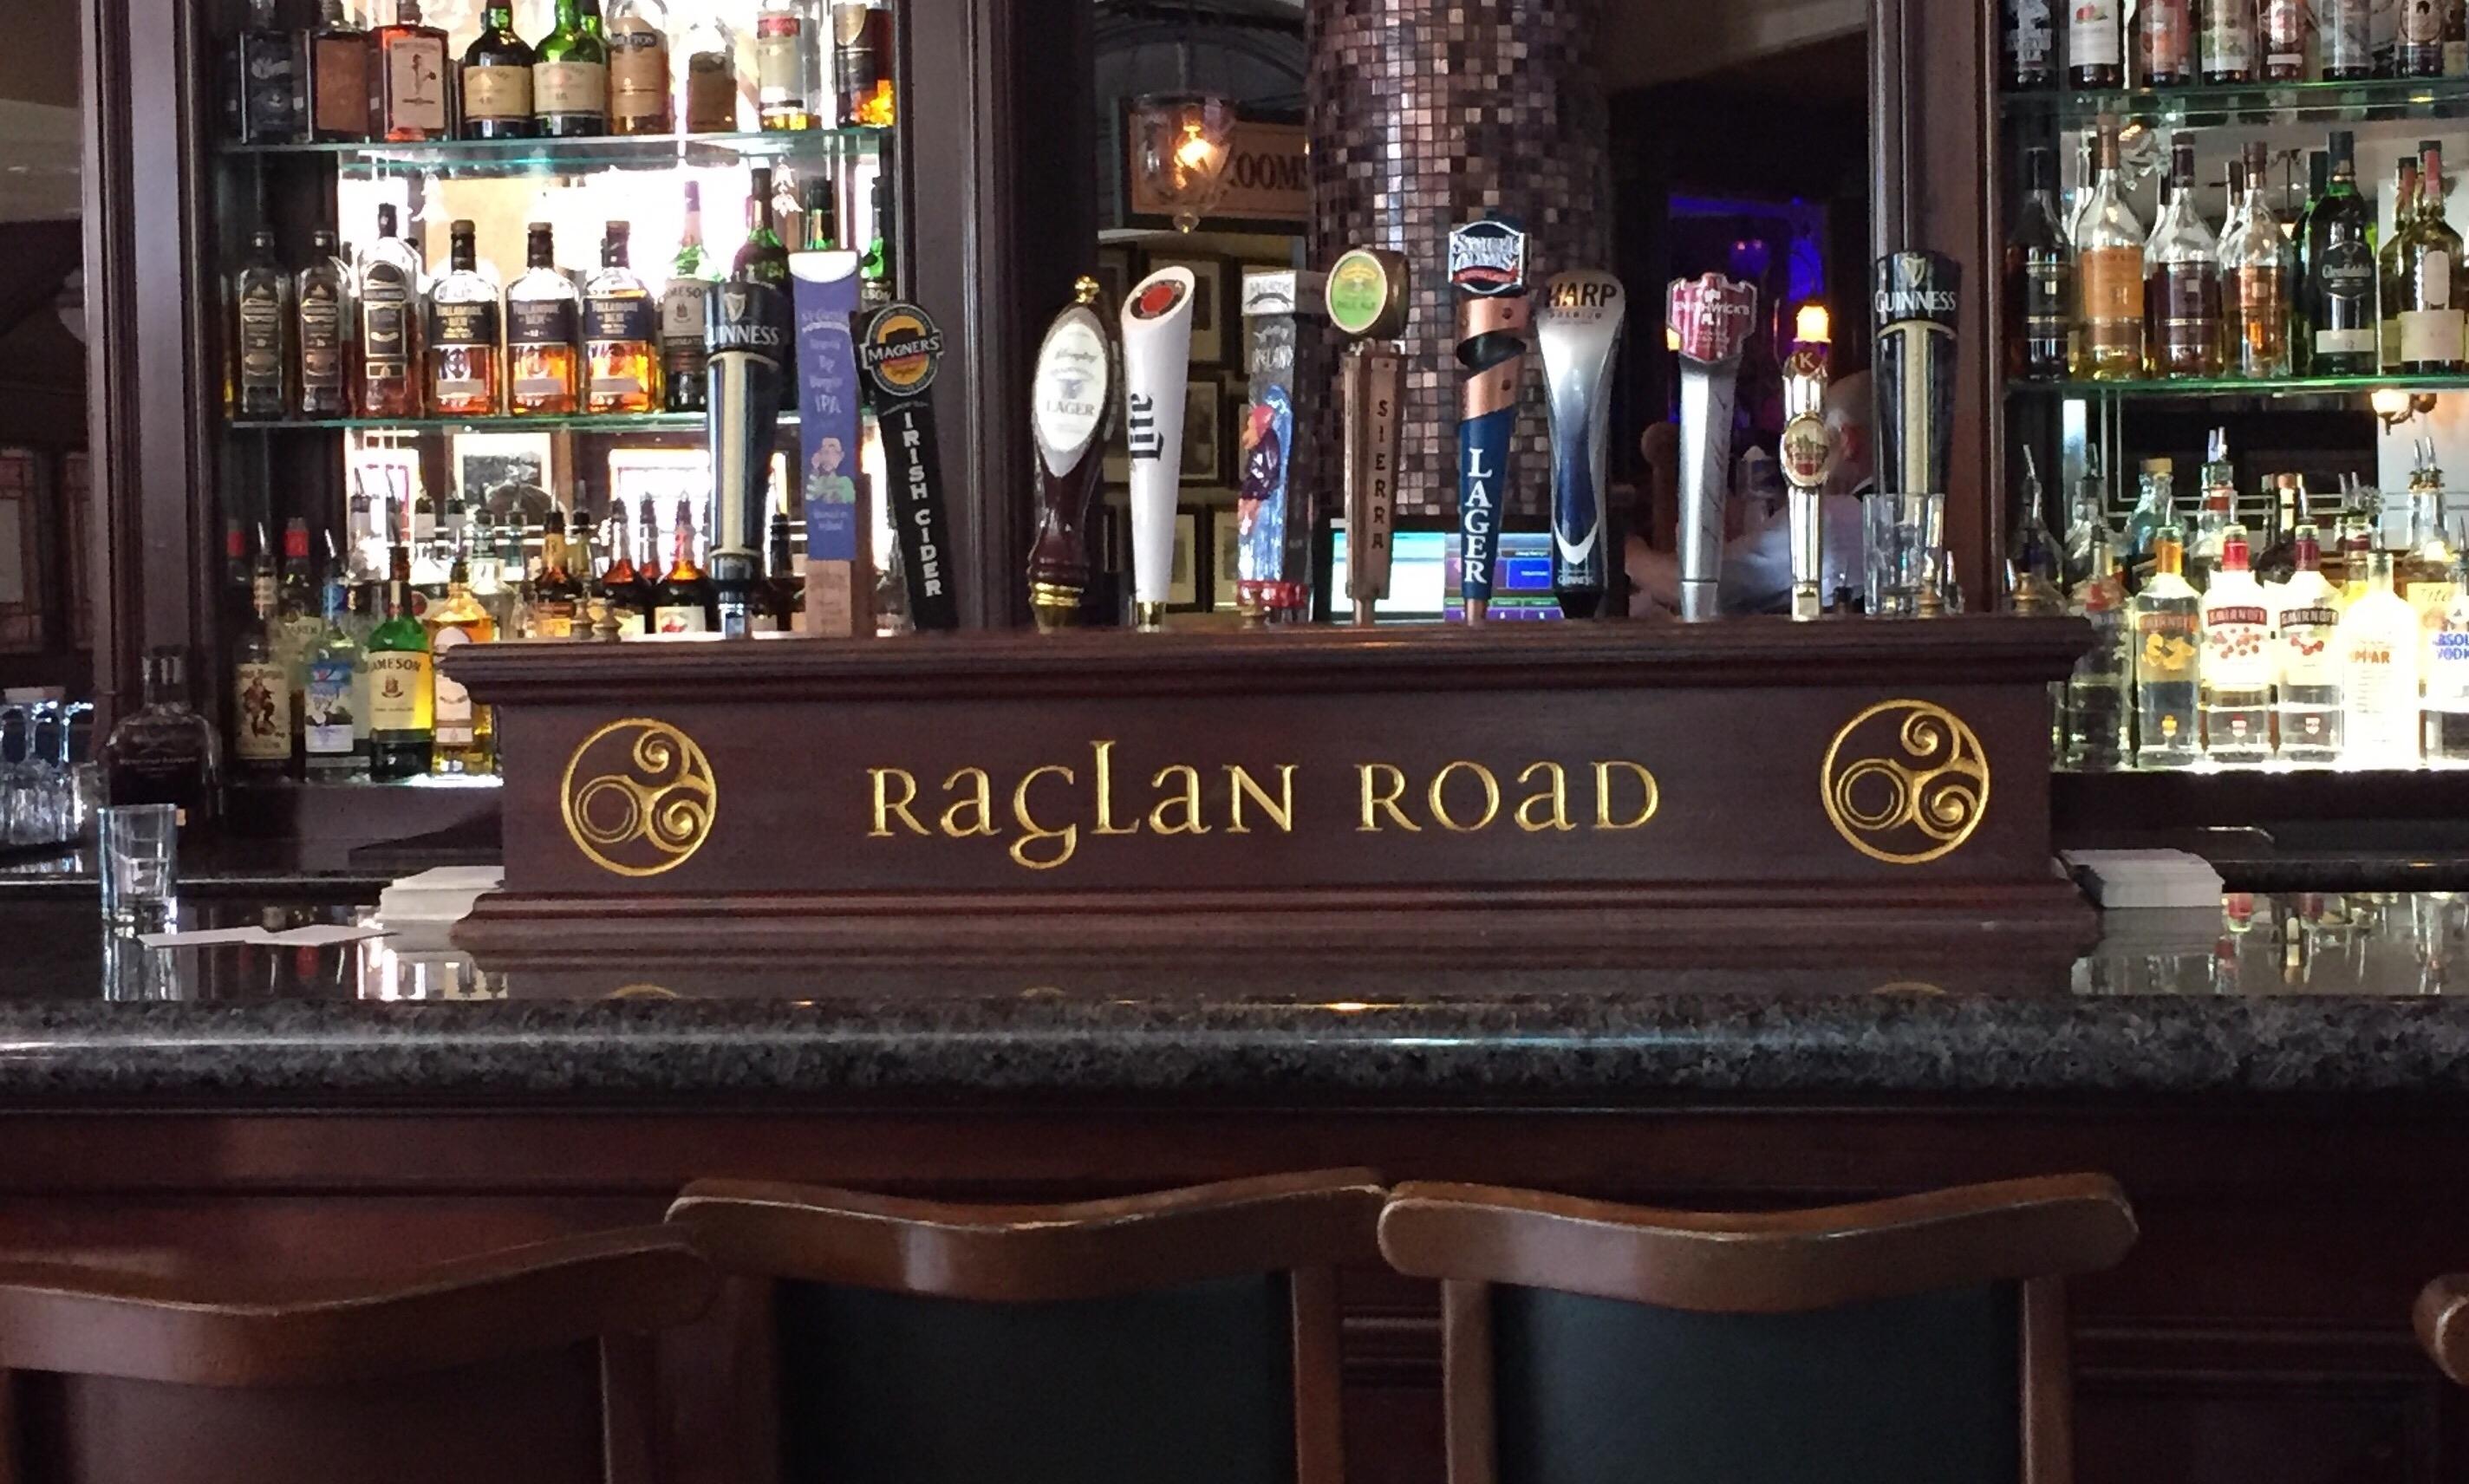 You're Gonna Love Raglan Road